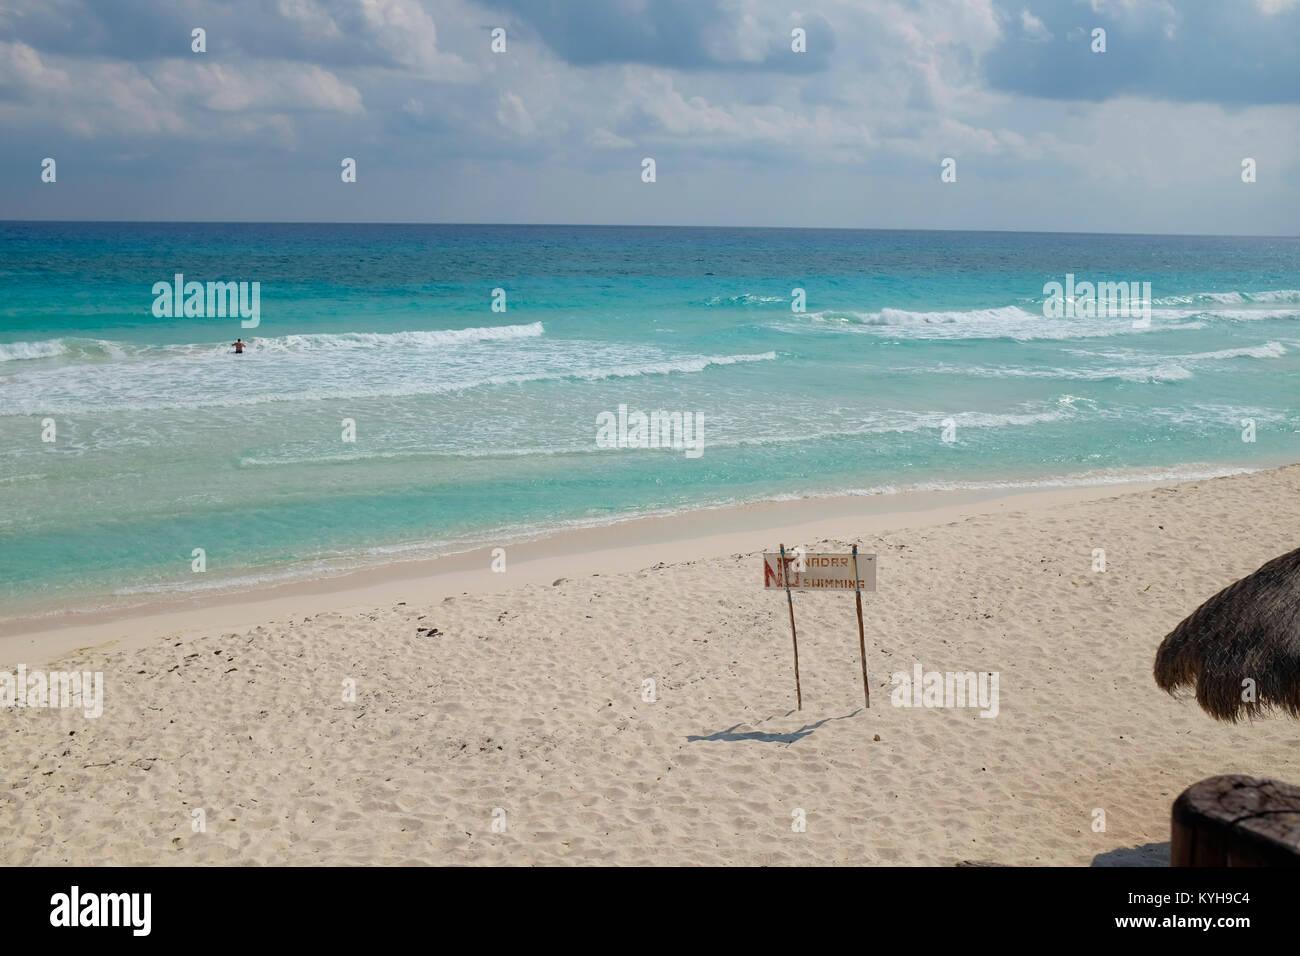 Playa San Martin, Cozumel Mexico. Stock Photo